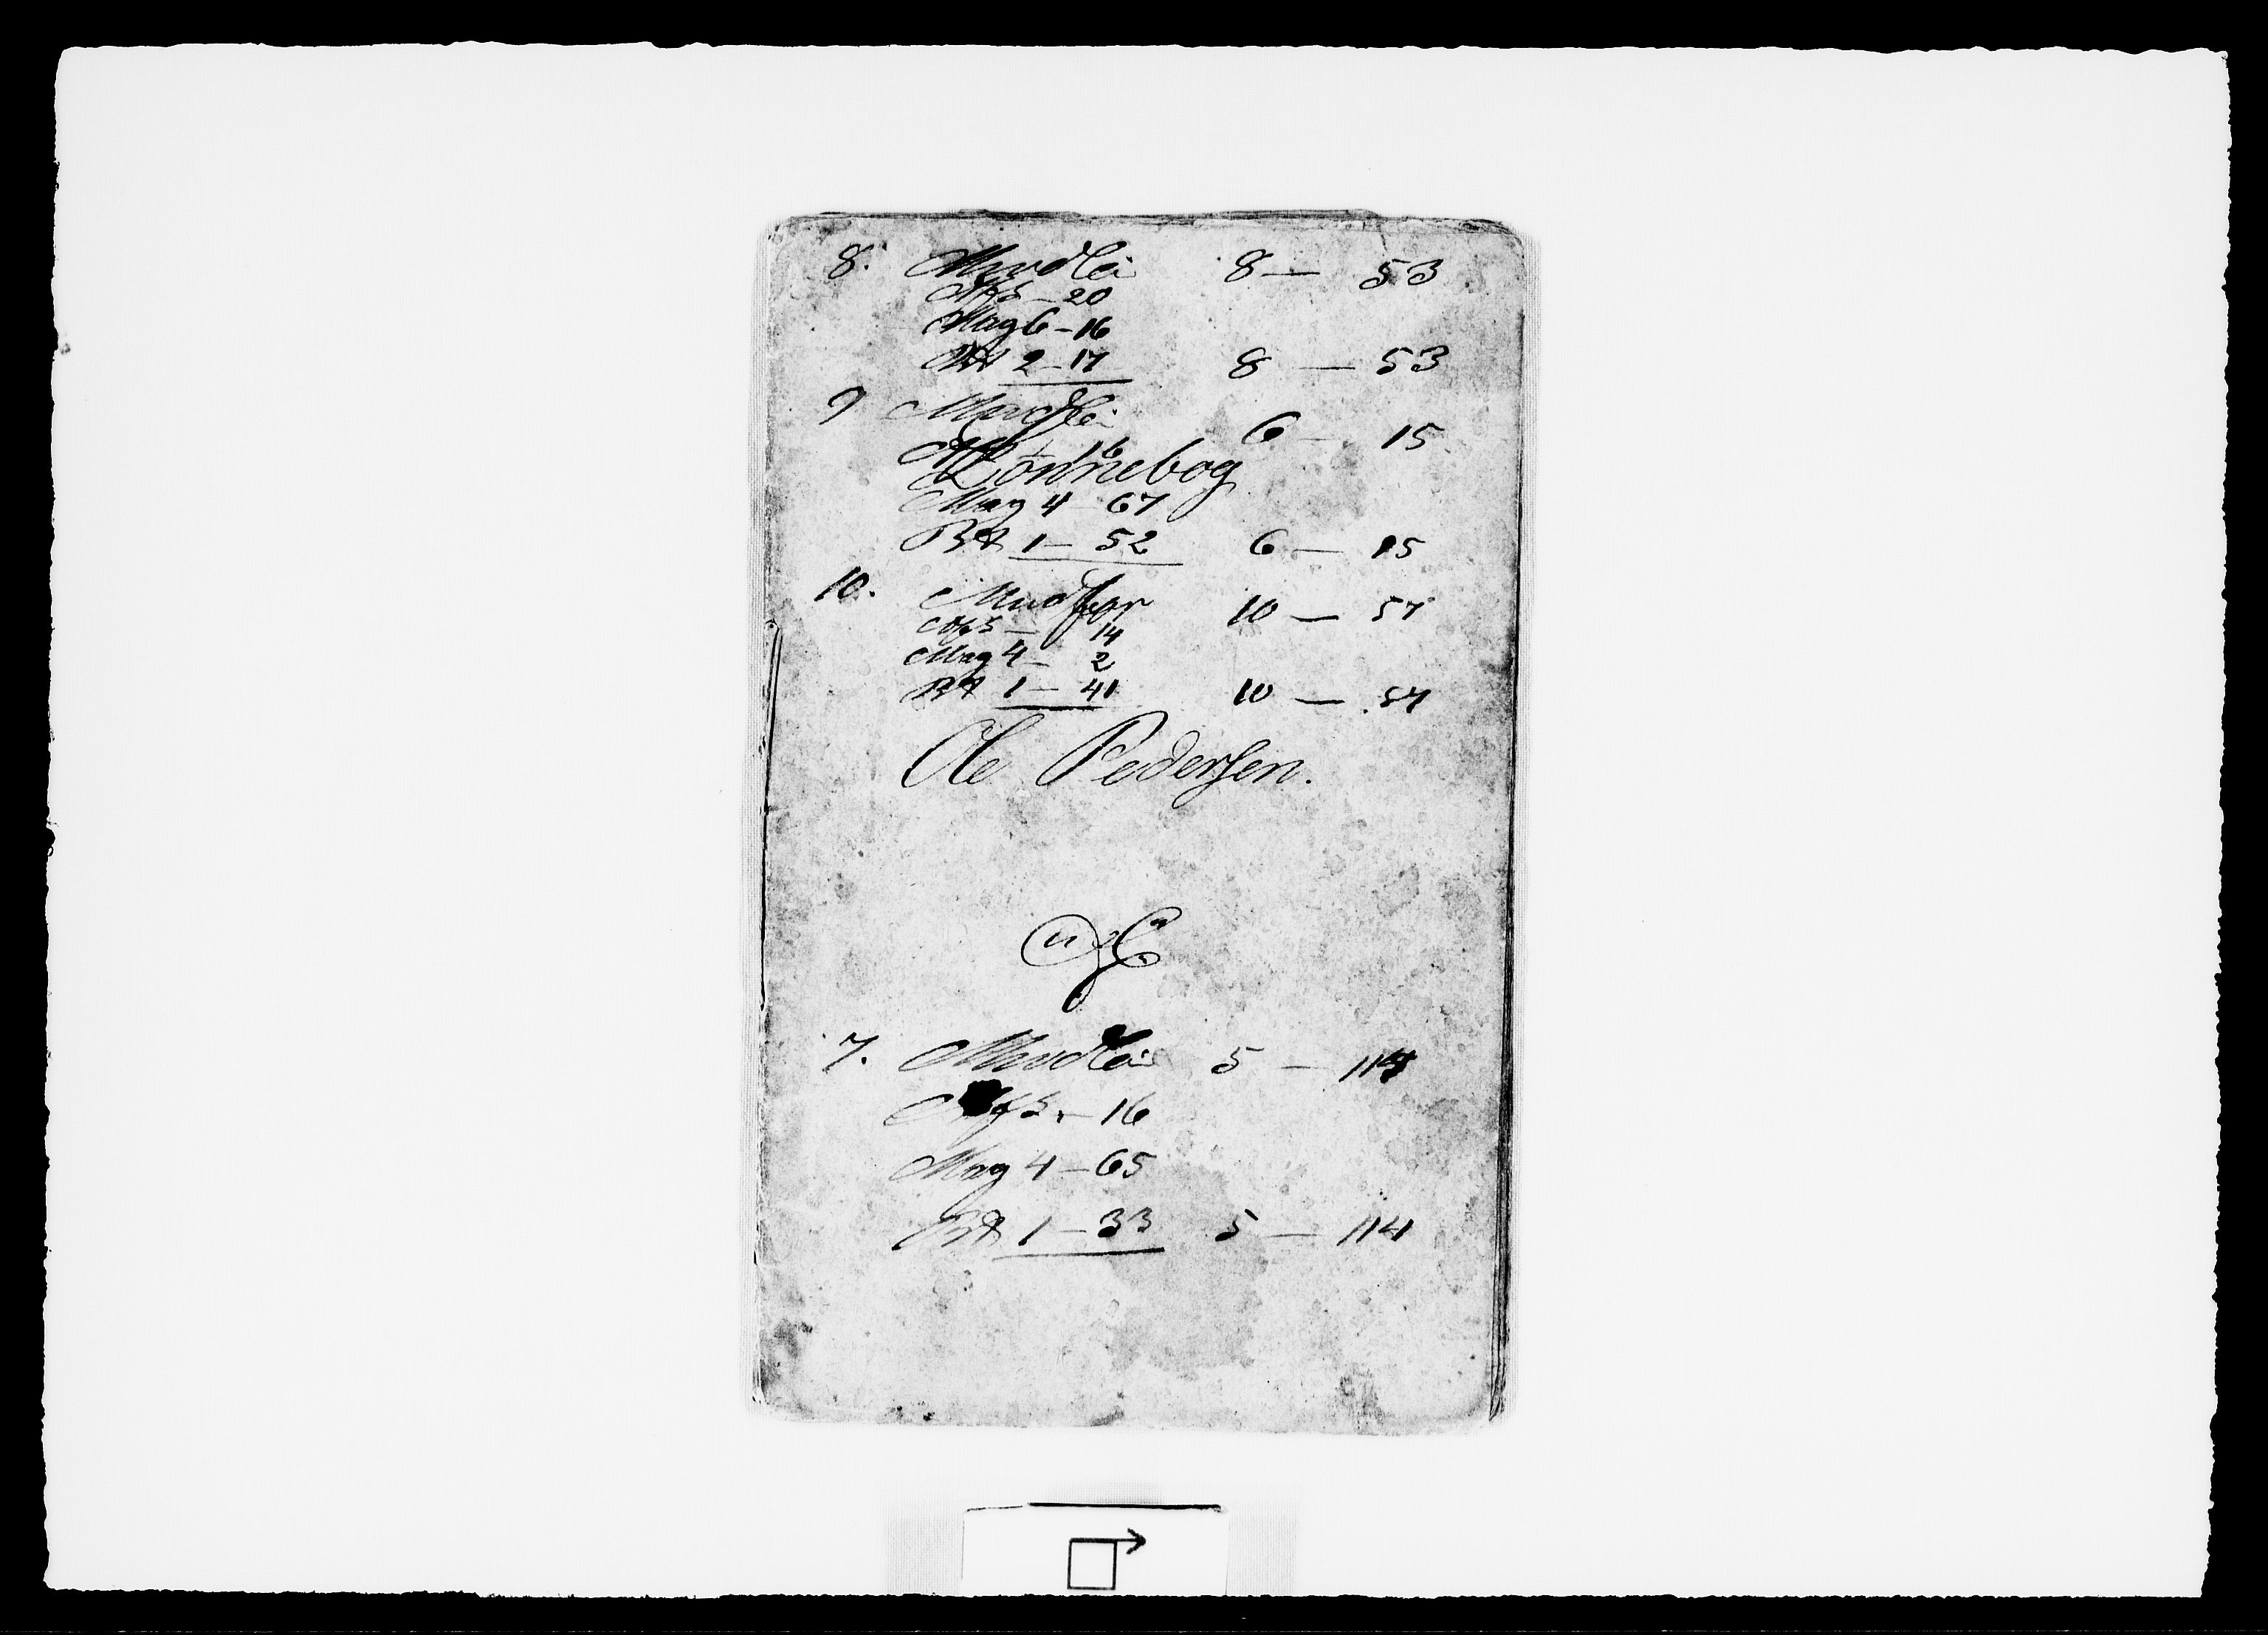 RA, Modums Blaafarveværk, G/Gd/Gdd/L0298, 1840-1841, s. 2